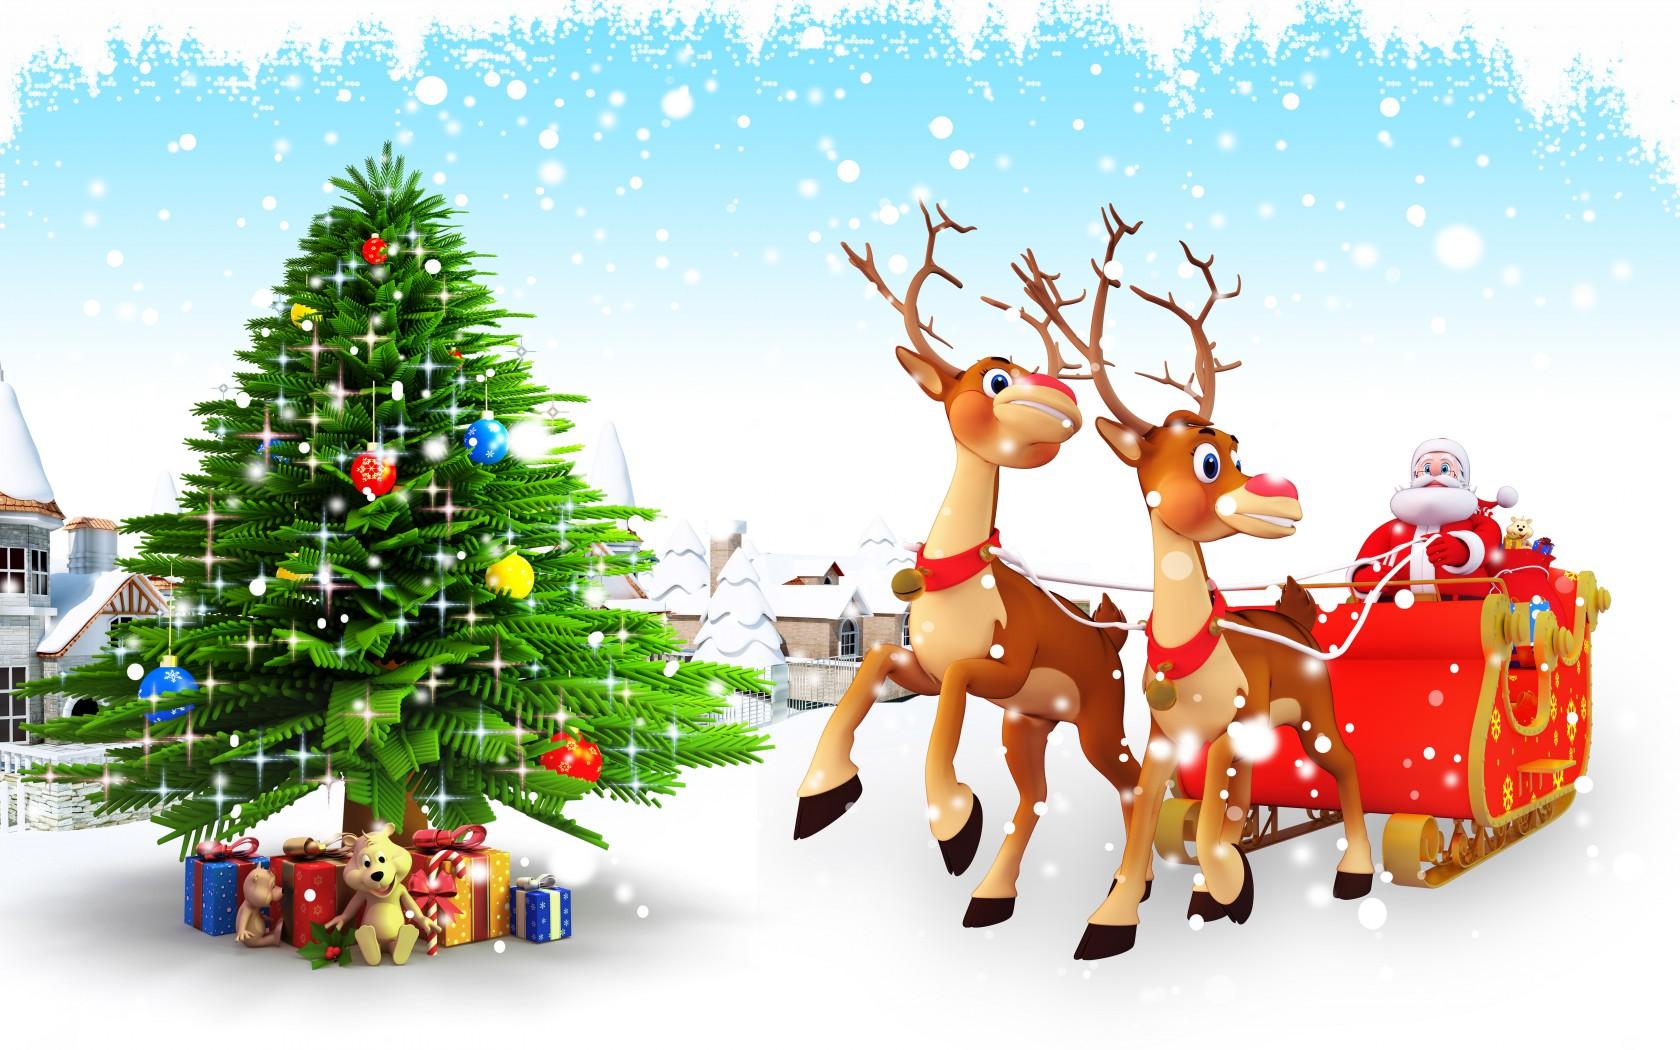 Christmas Tree And Santa Cartoon Wallpaper photos of Christmas Cartoon 1680x1050